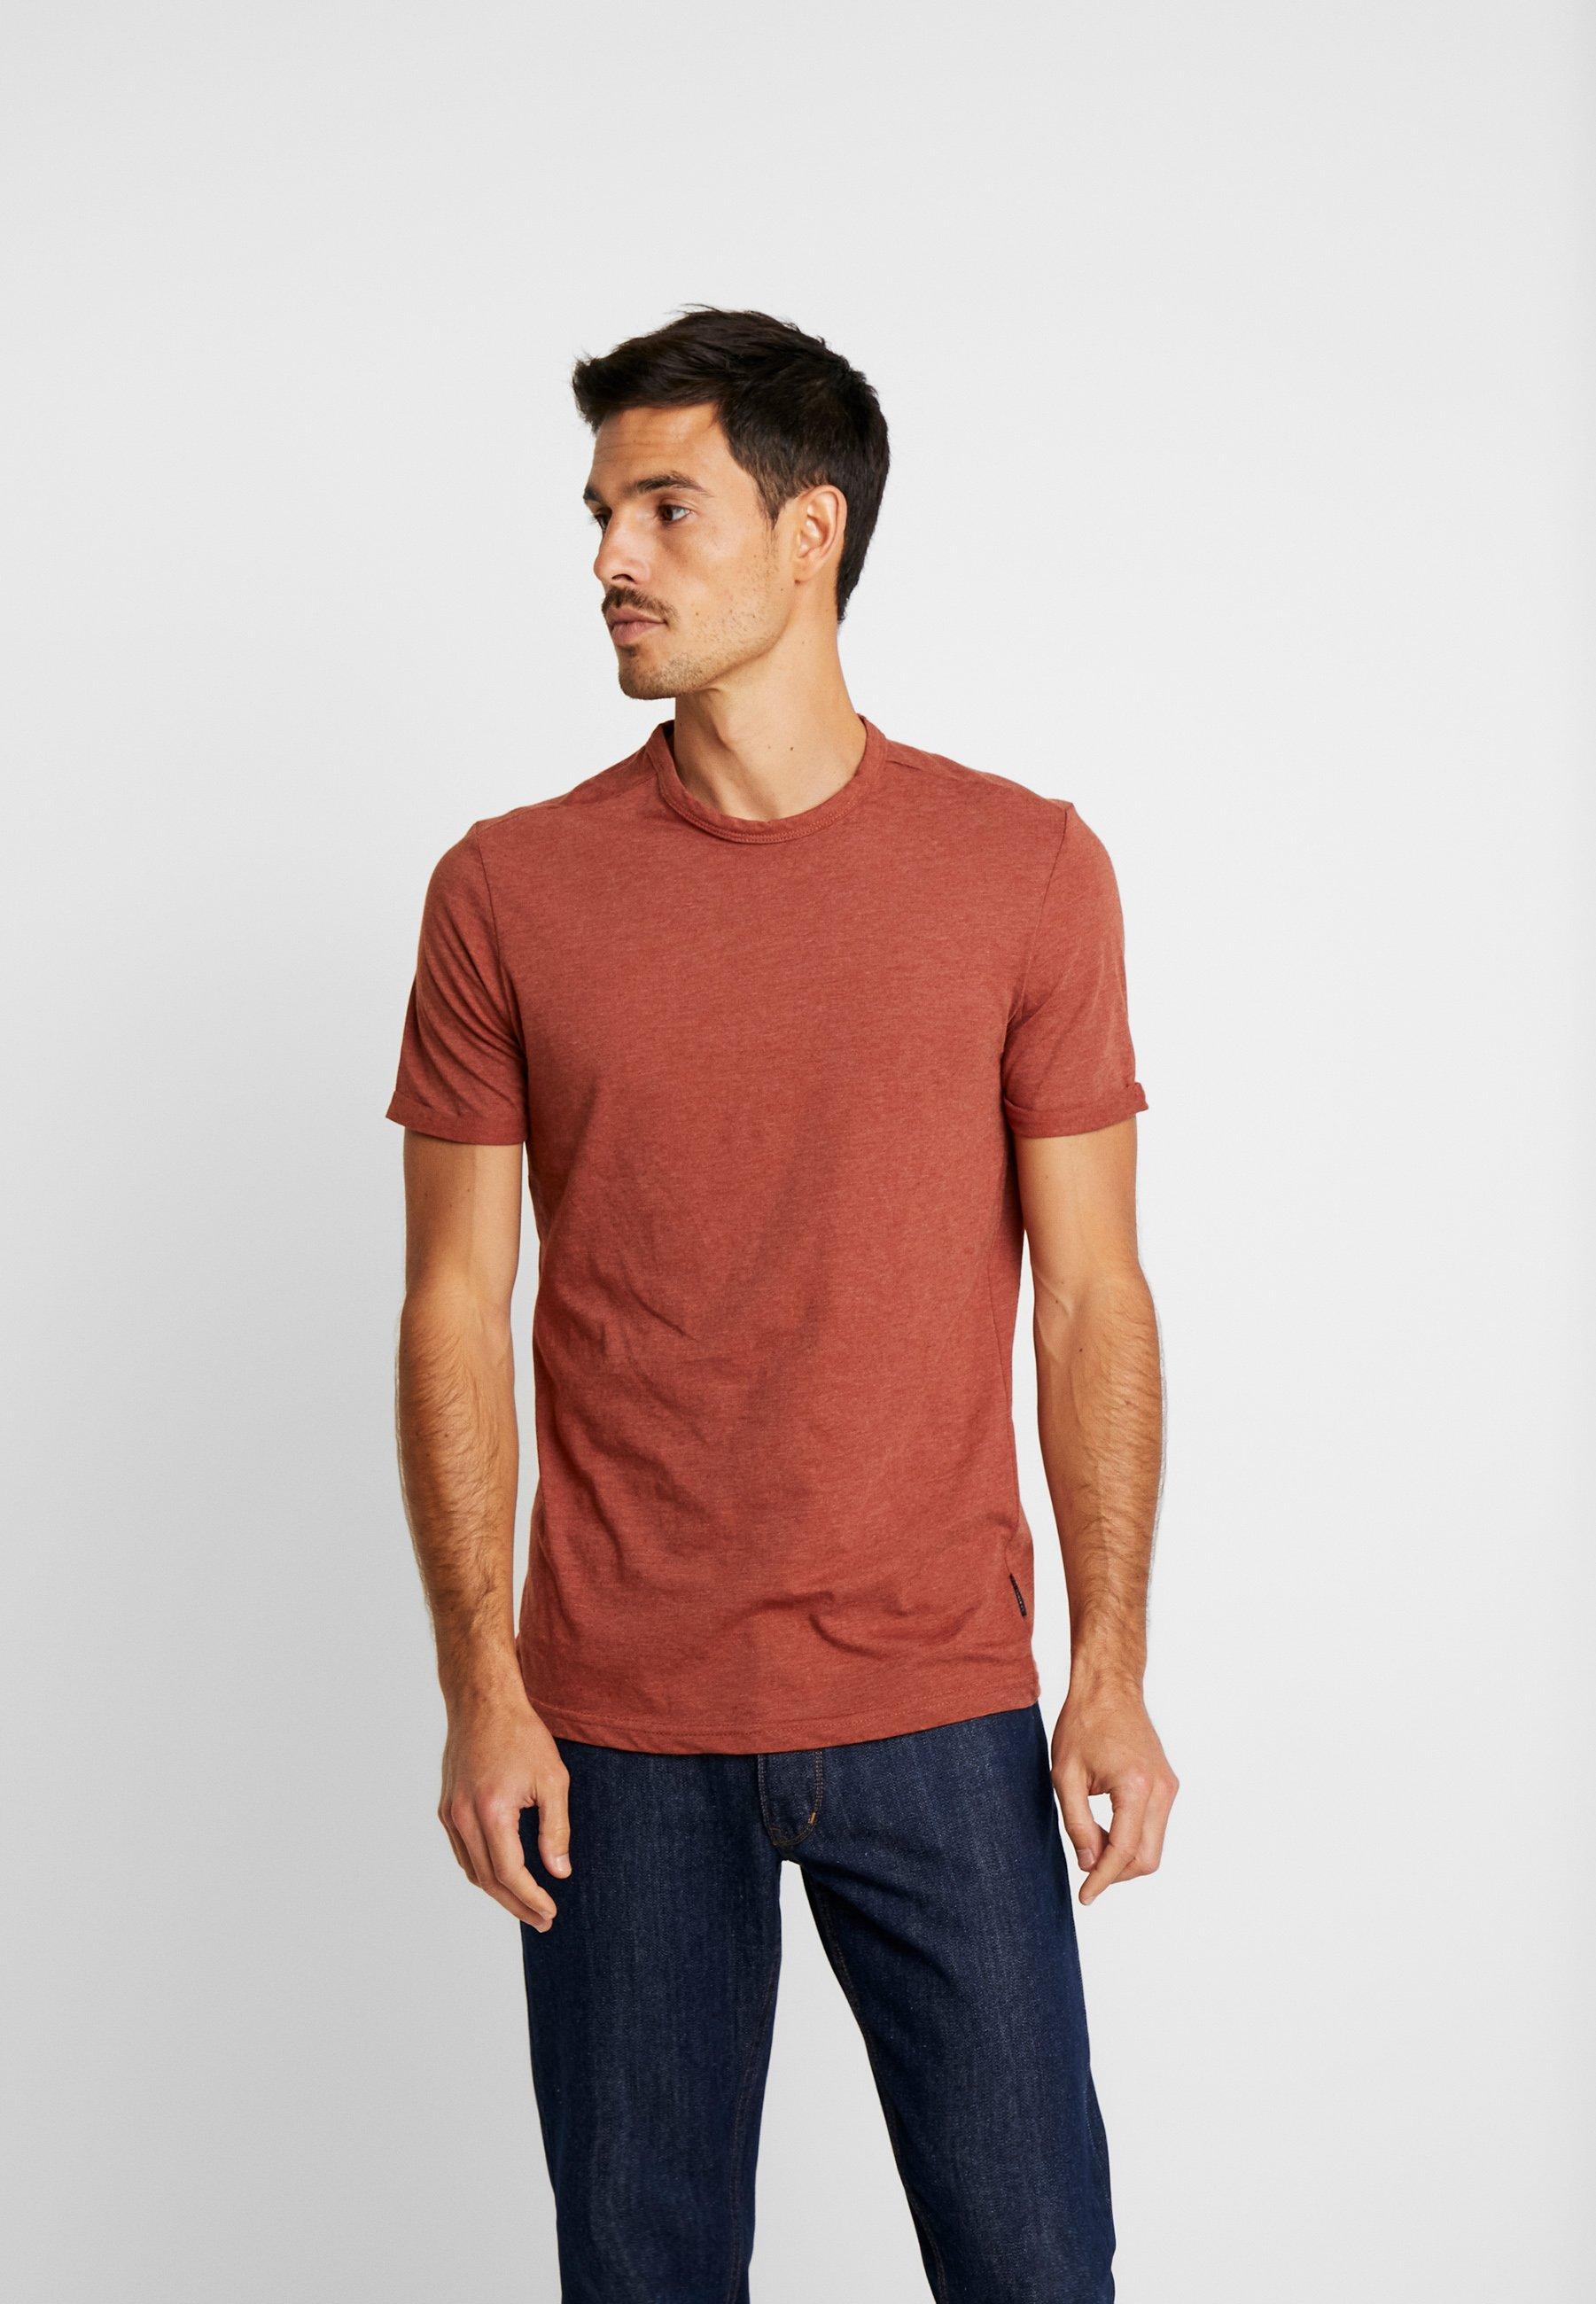 BasicT Springfield Red BasicT shirt Basique Springfield DY2HWE9I